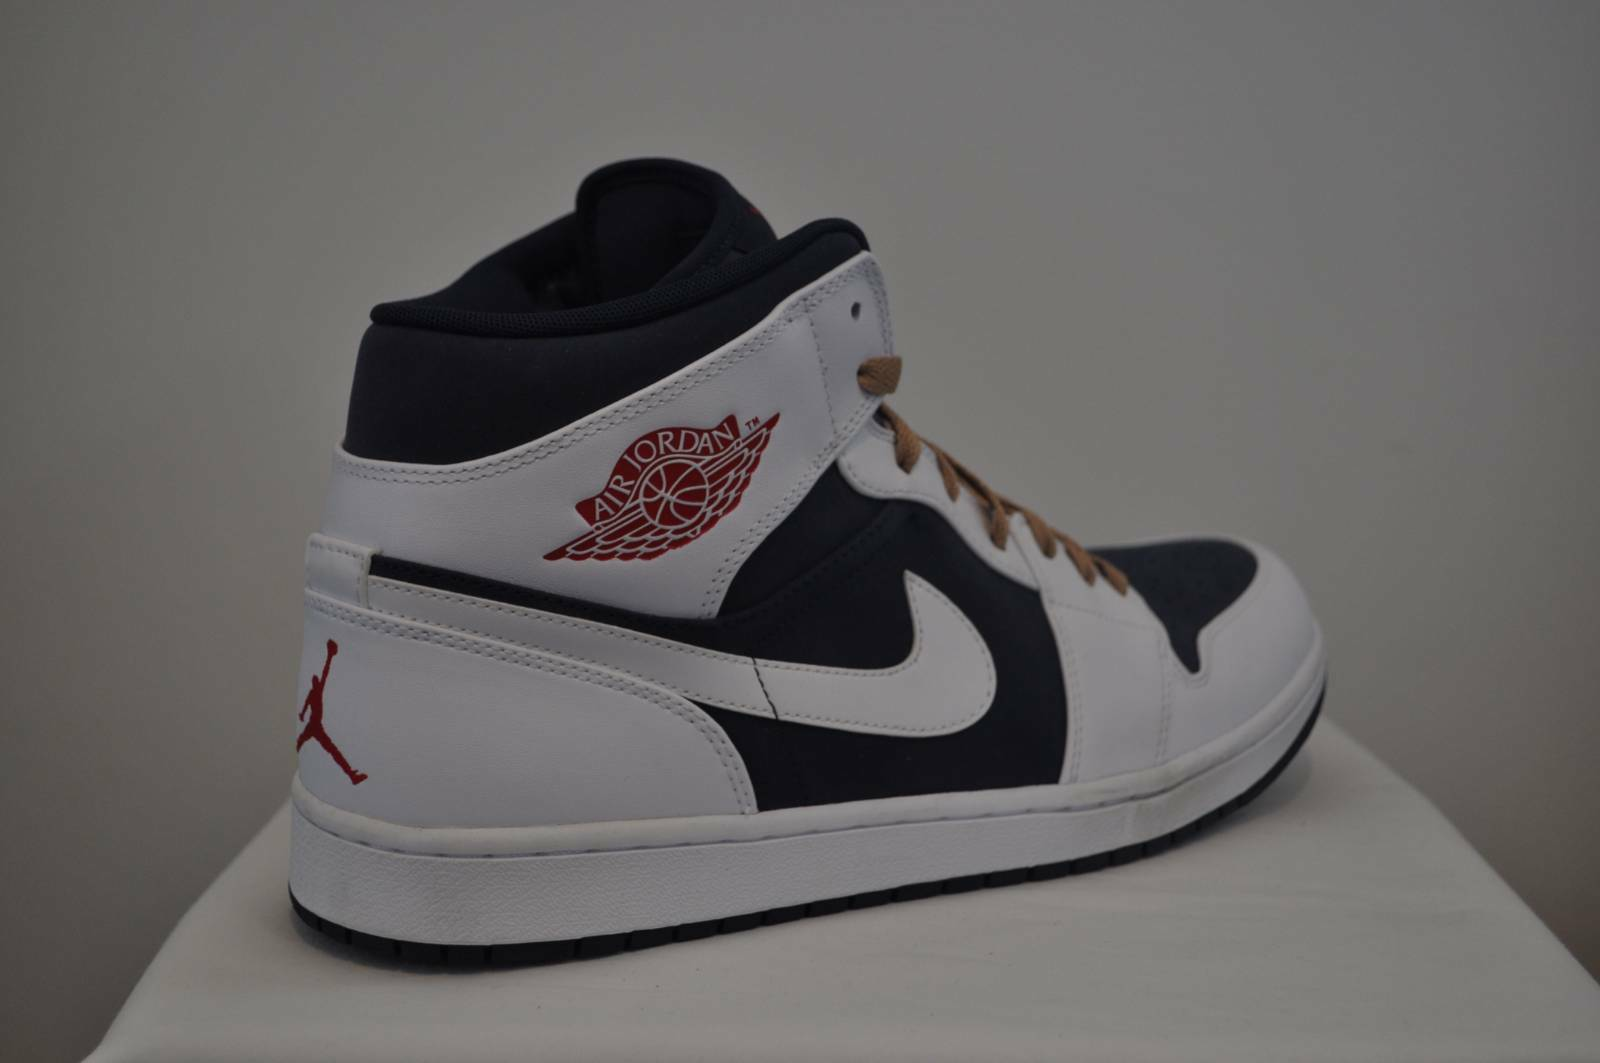 best loved 0c300 8bc9d Nike Air Jordan Jordan Jordan Retro 1 Mid Obsidian Gym Red White Olympic  size 14 US